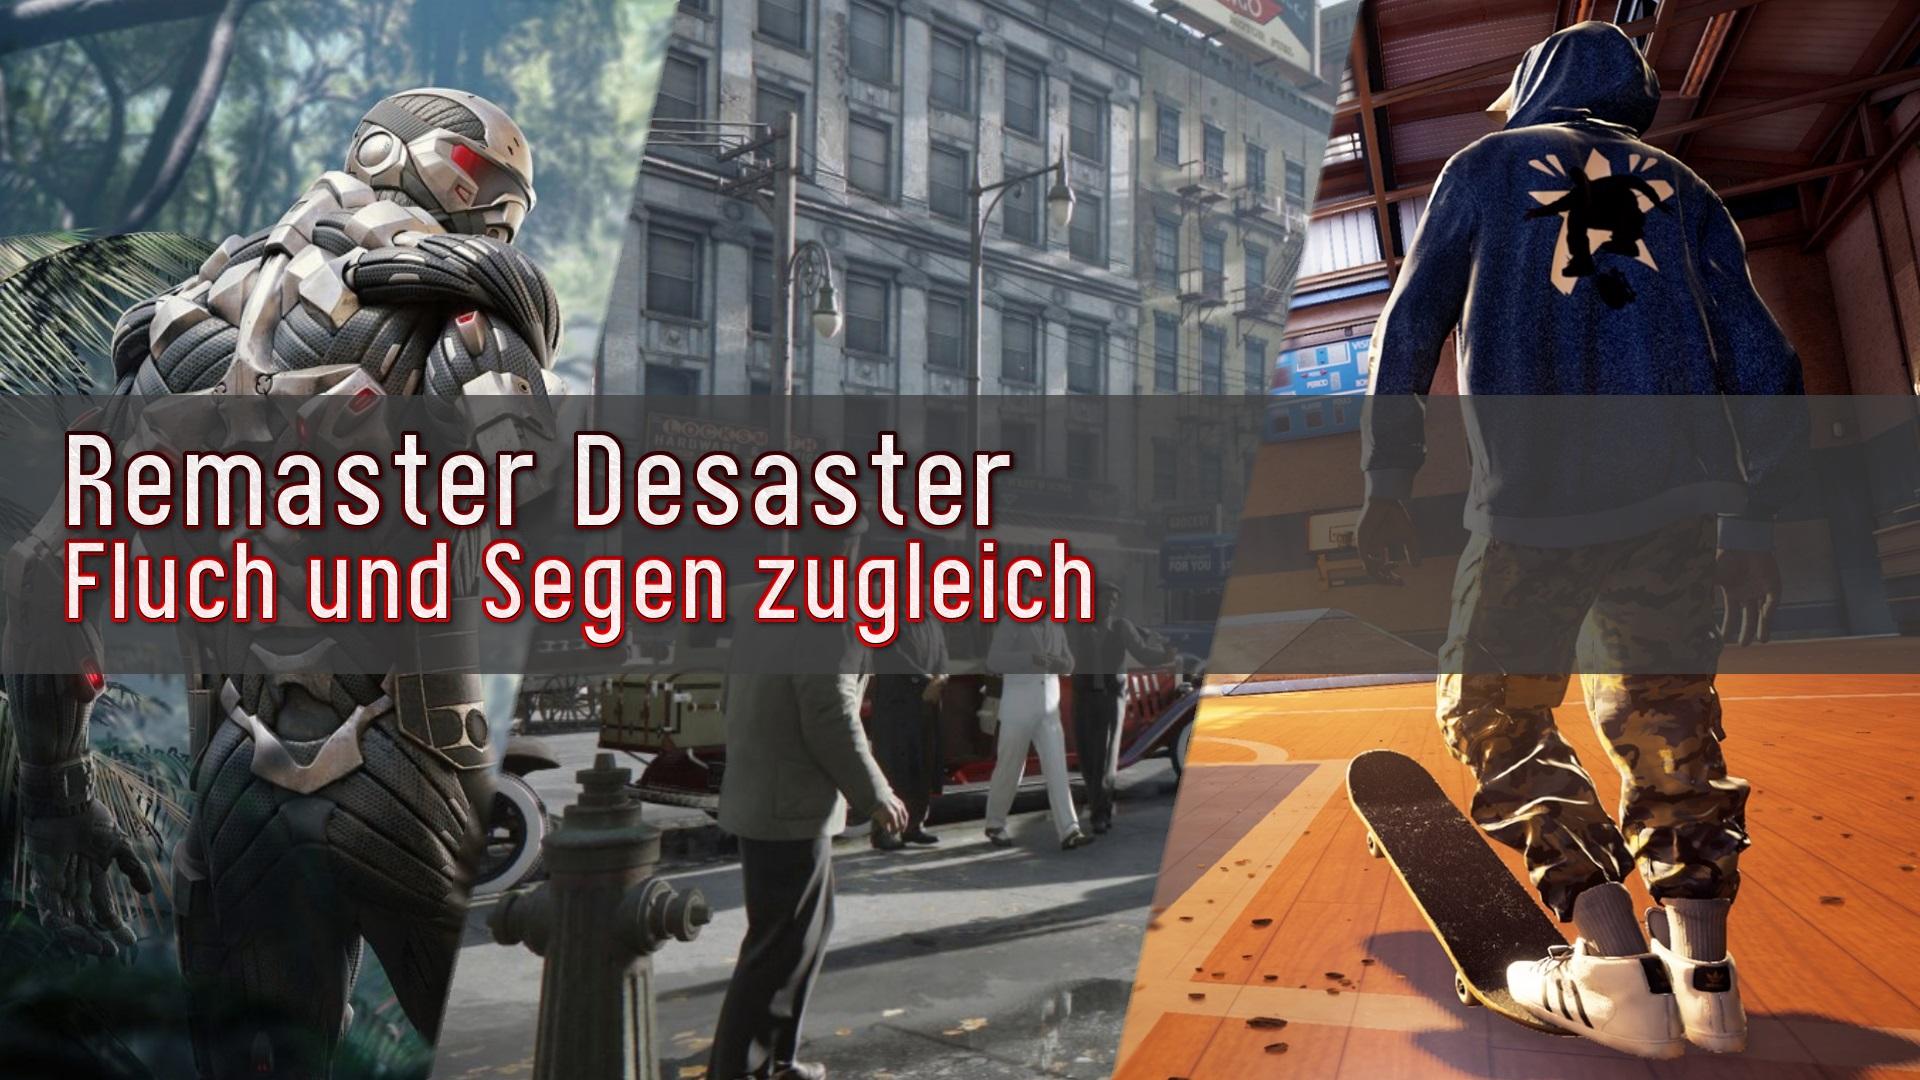 Remaster Desaster